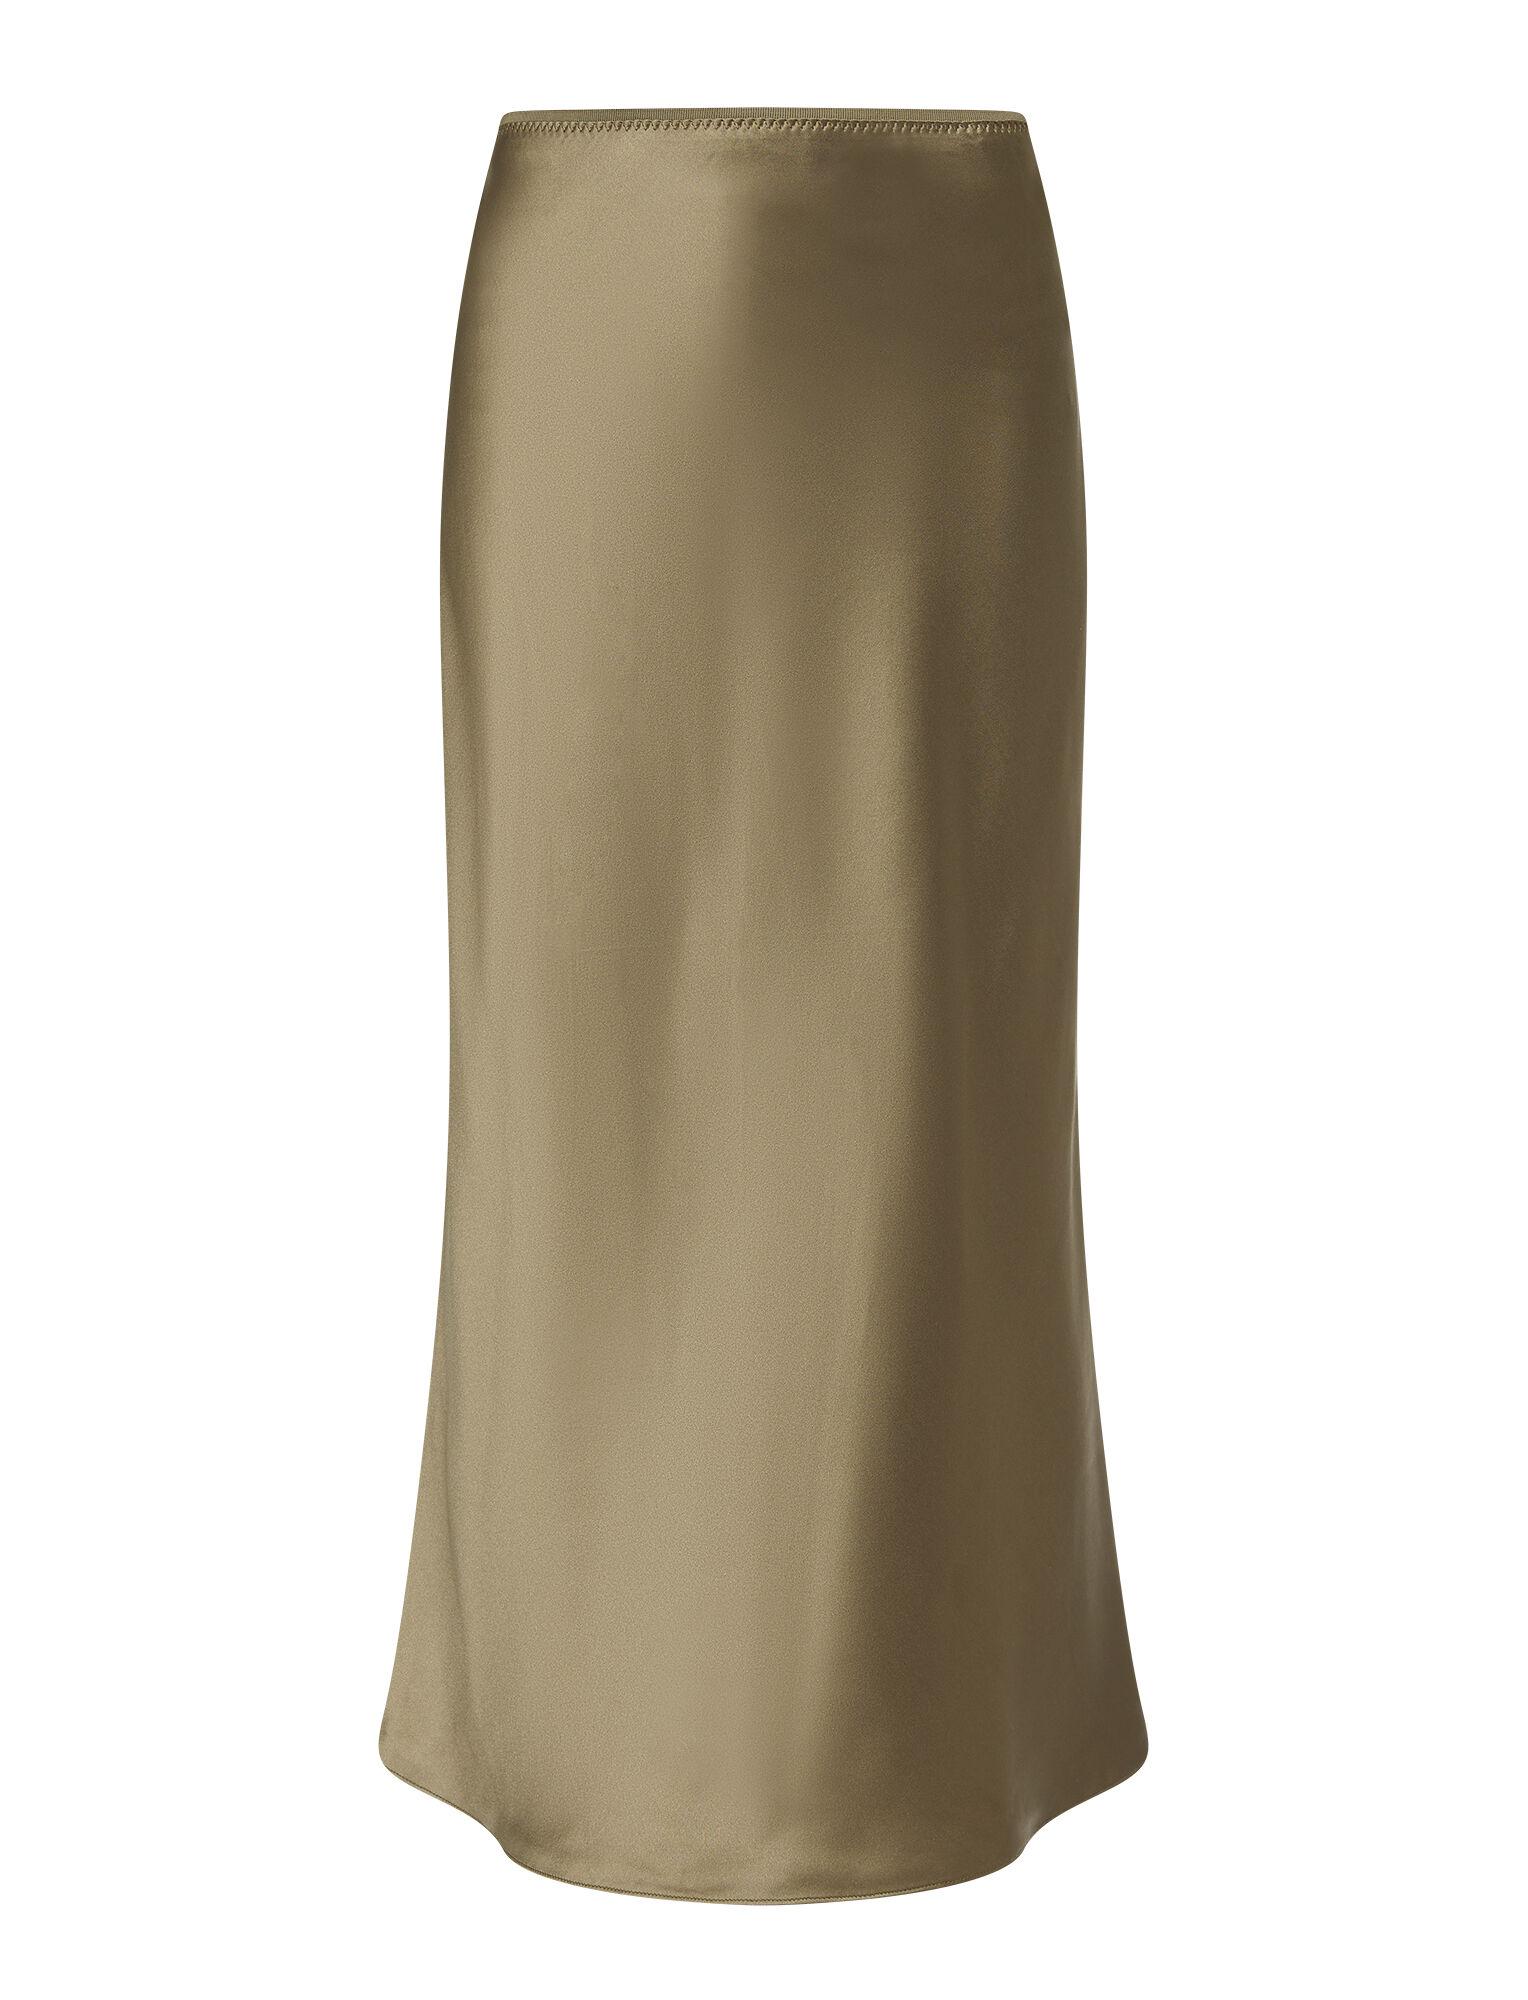 Joseph, Silk Satin Isaak Skirt, in ELM